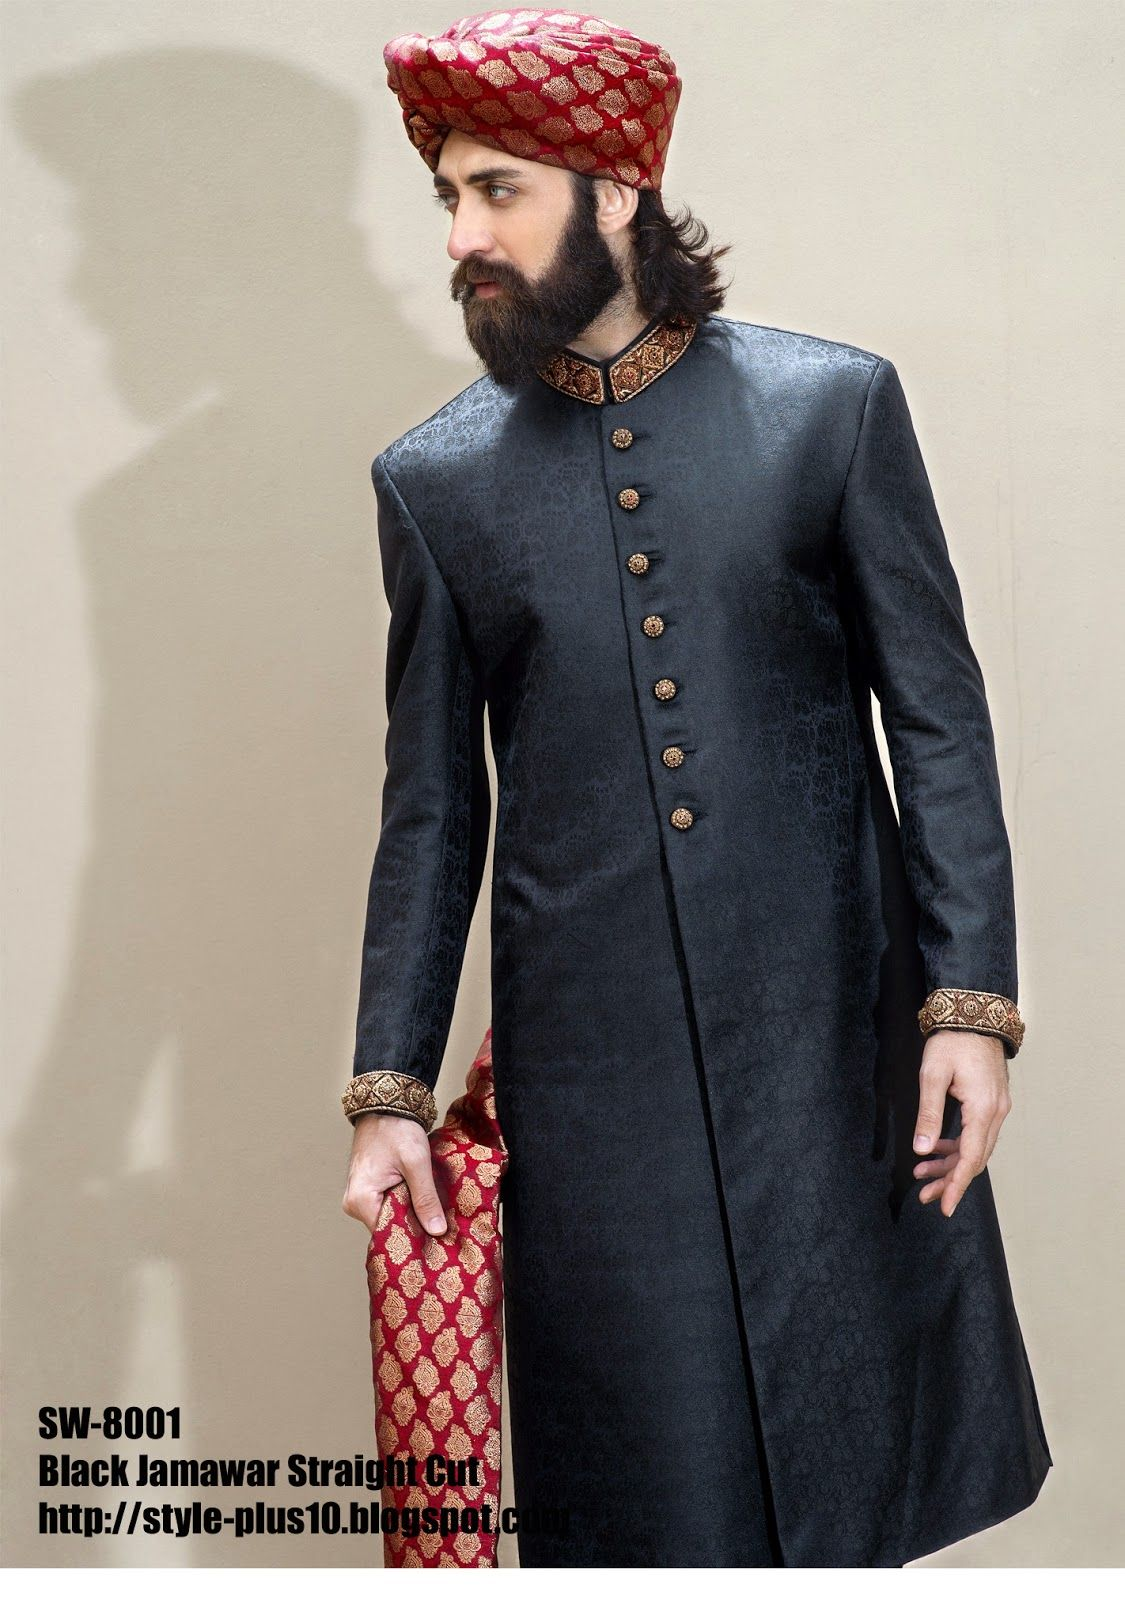 Black Jamawar Straight Cut Sherwani with red and gold Royal headgear